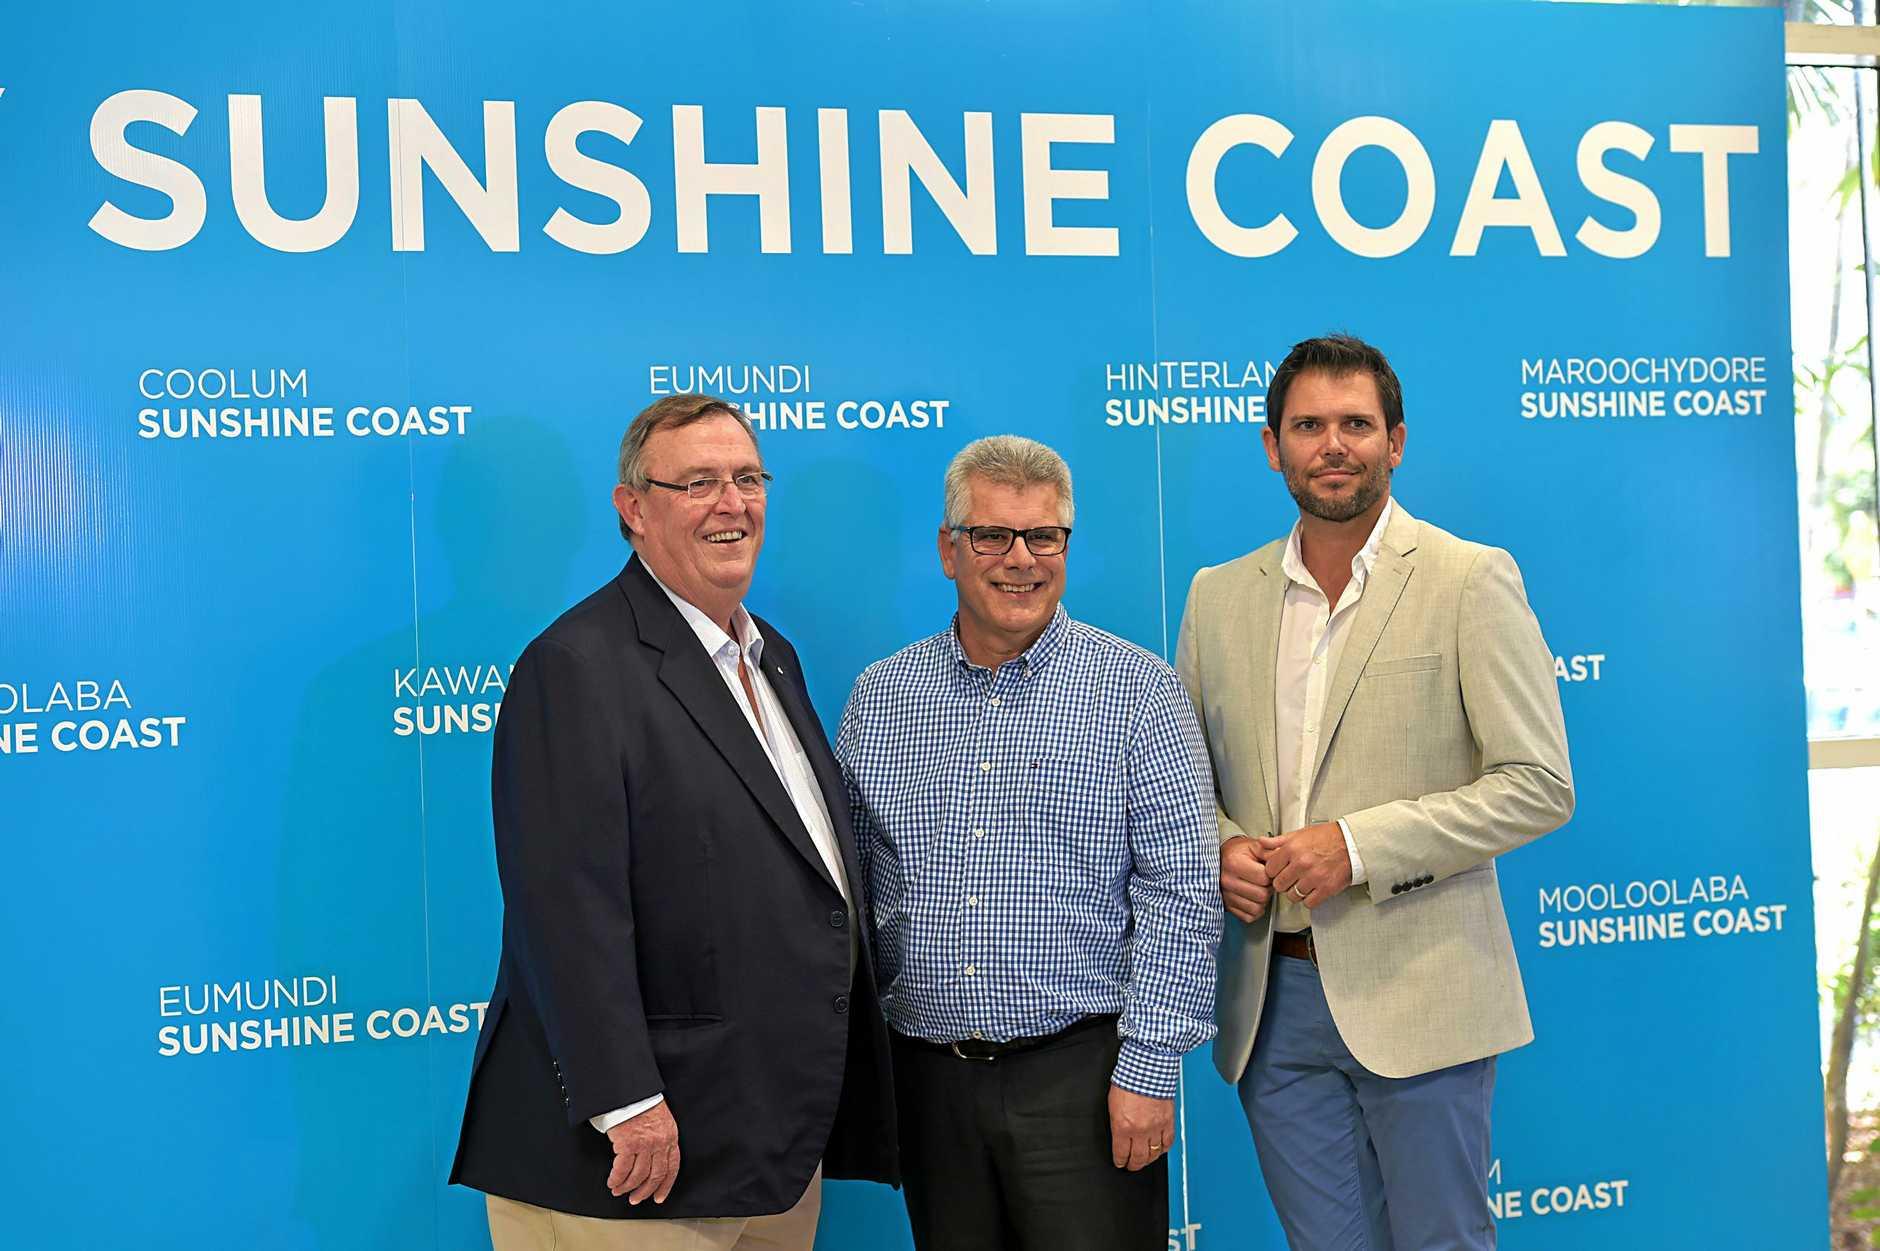 Sunshine Coast Airport, Tourism Noosa and Visit Sunshine Coast form a new partnership.David Ryan from Visit Sunshine Coast, Peter Pallot from Sunshine Coast Airport and Steve McPharlin from Tourism Noosa